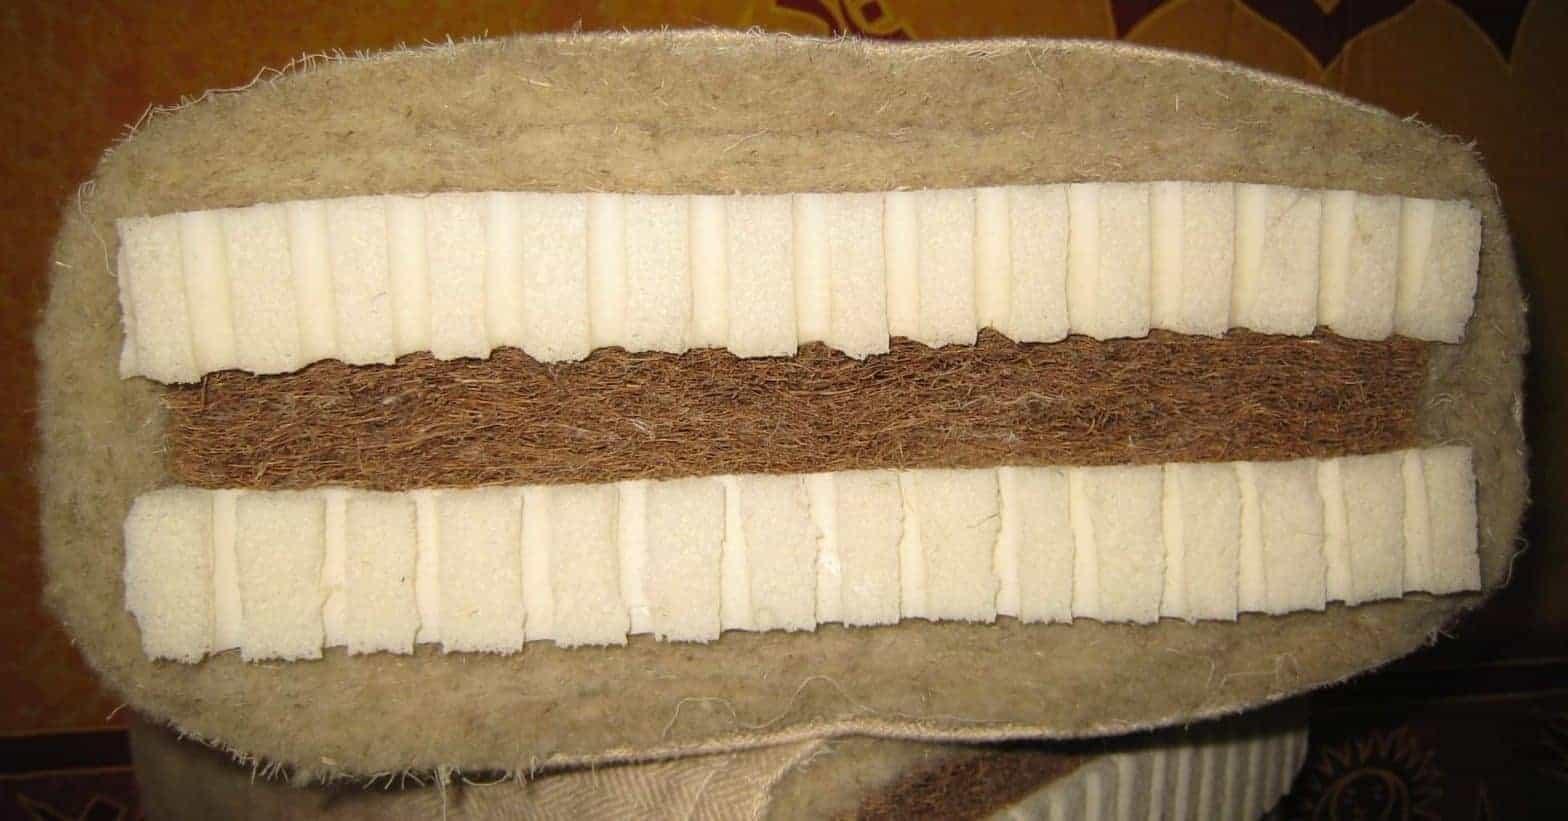 Mattress-coconutfibre+foam+hemp-_and_sheepwool_PNr°0085